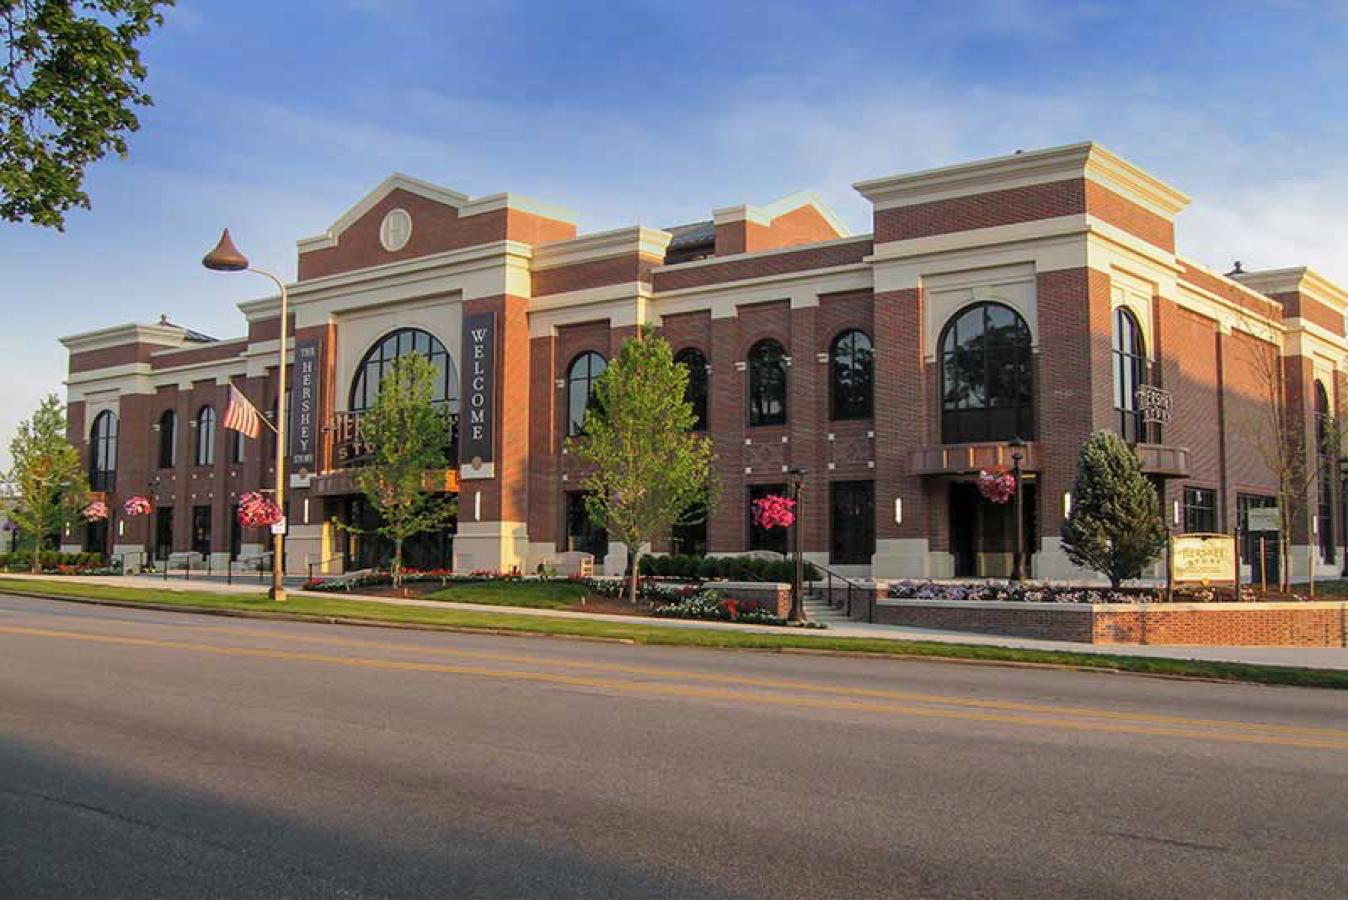 Exterior of Hershey Story Museum